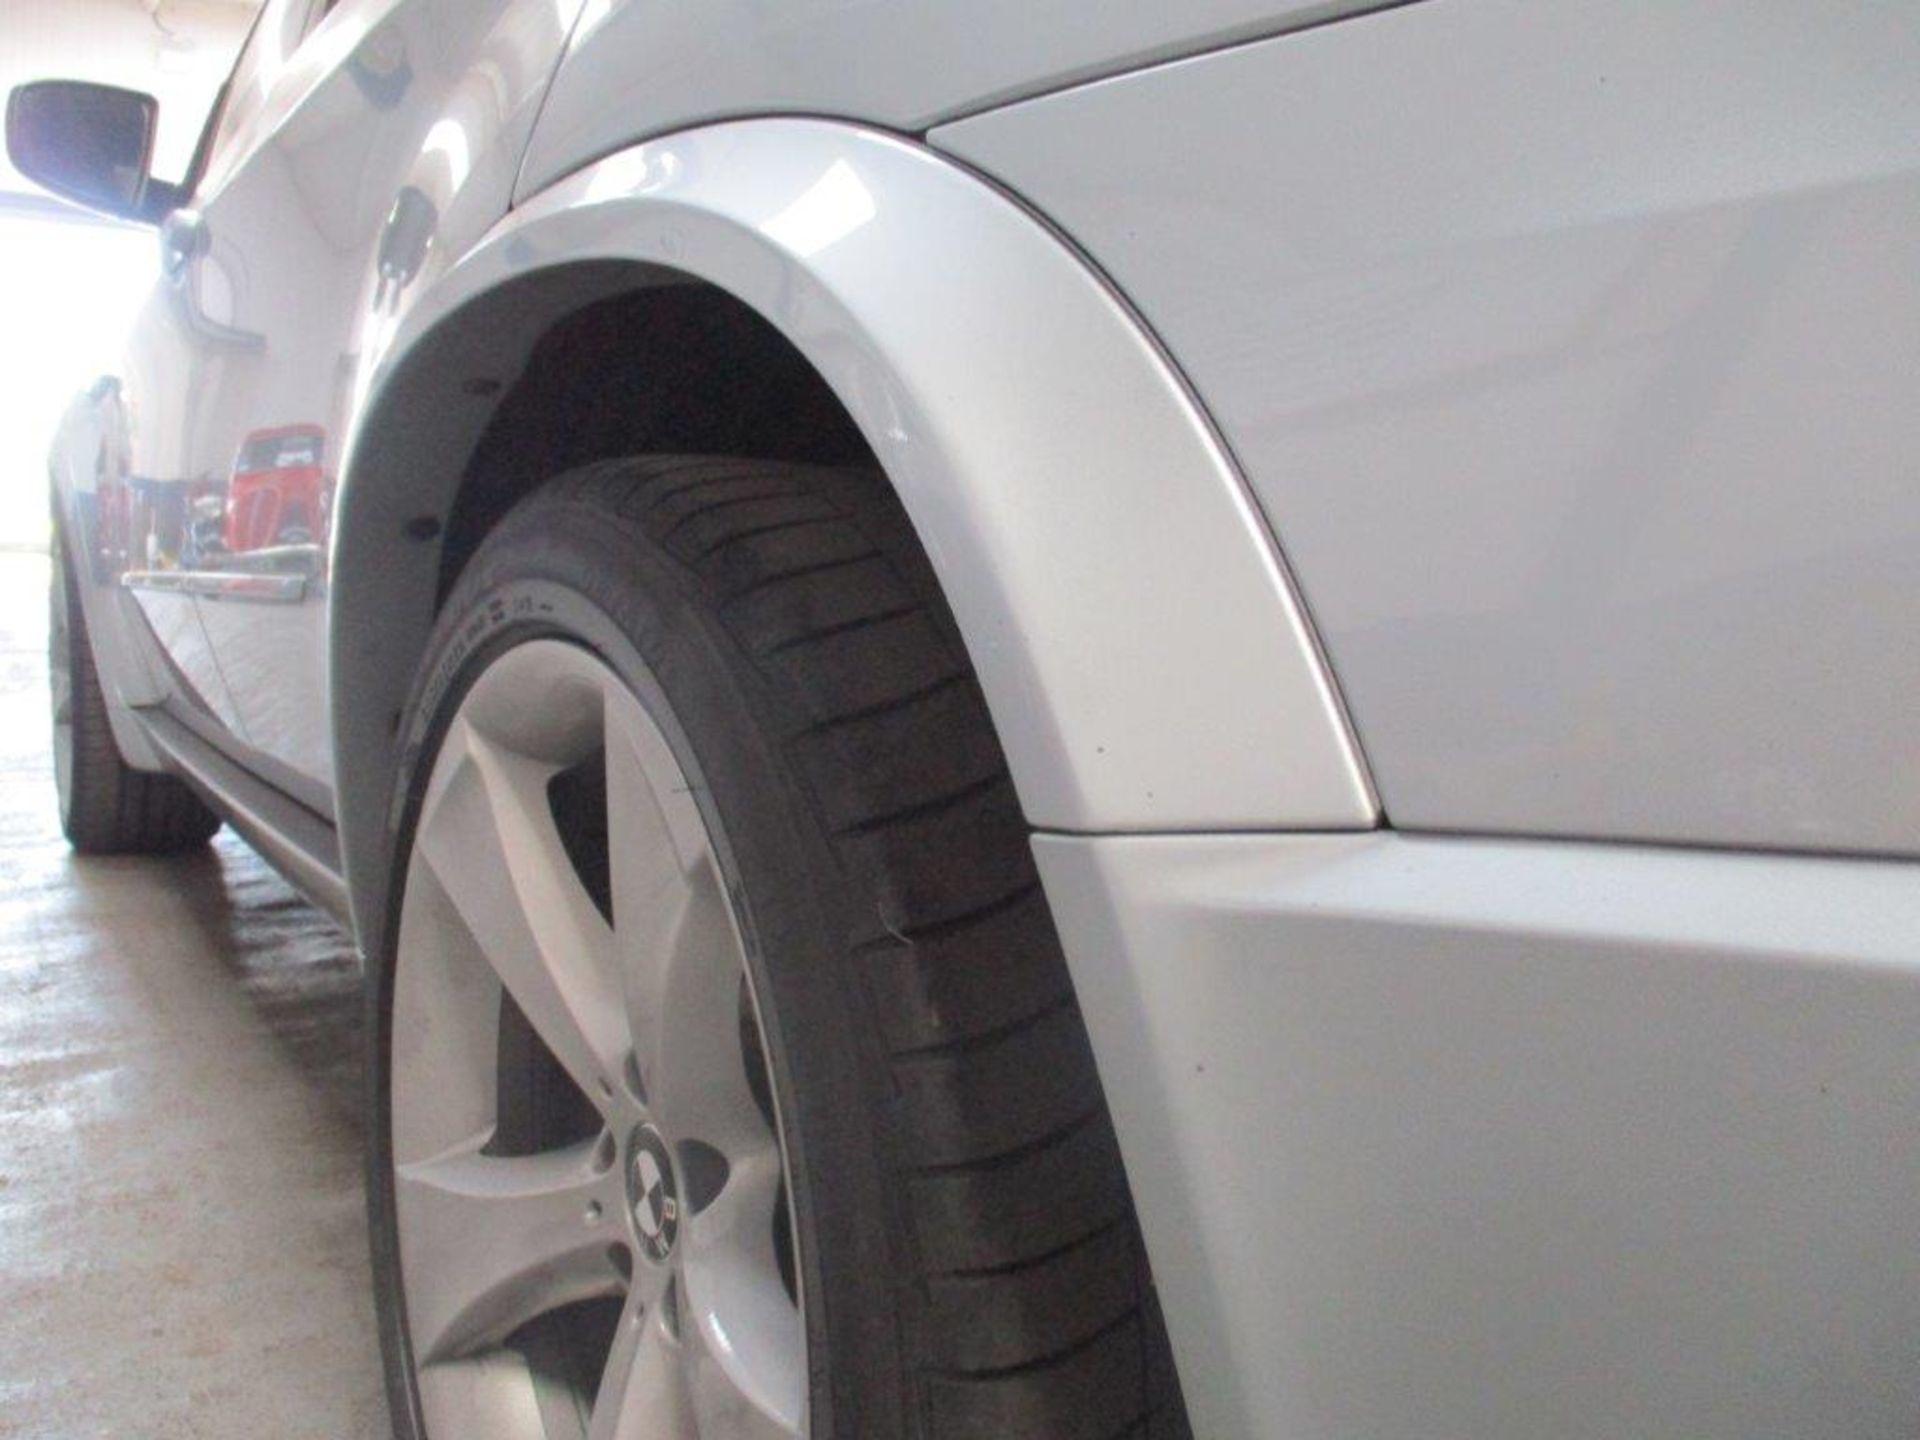 60 10 BMW X5 M Turbo Auto - Image 30 of 35